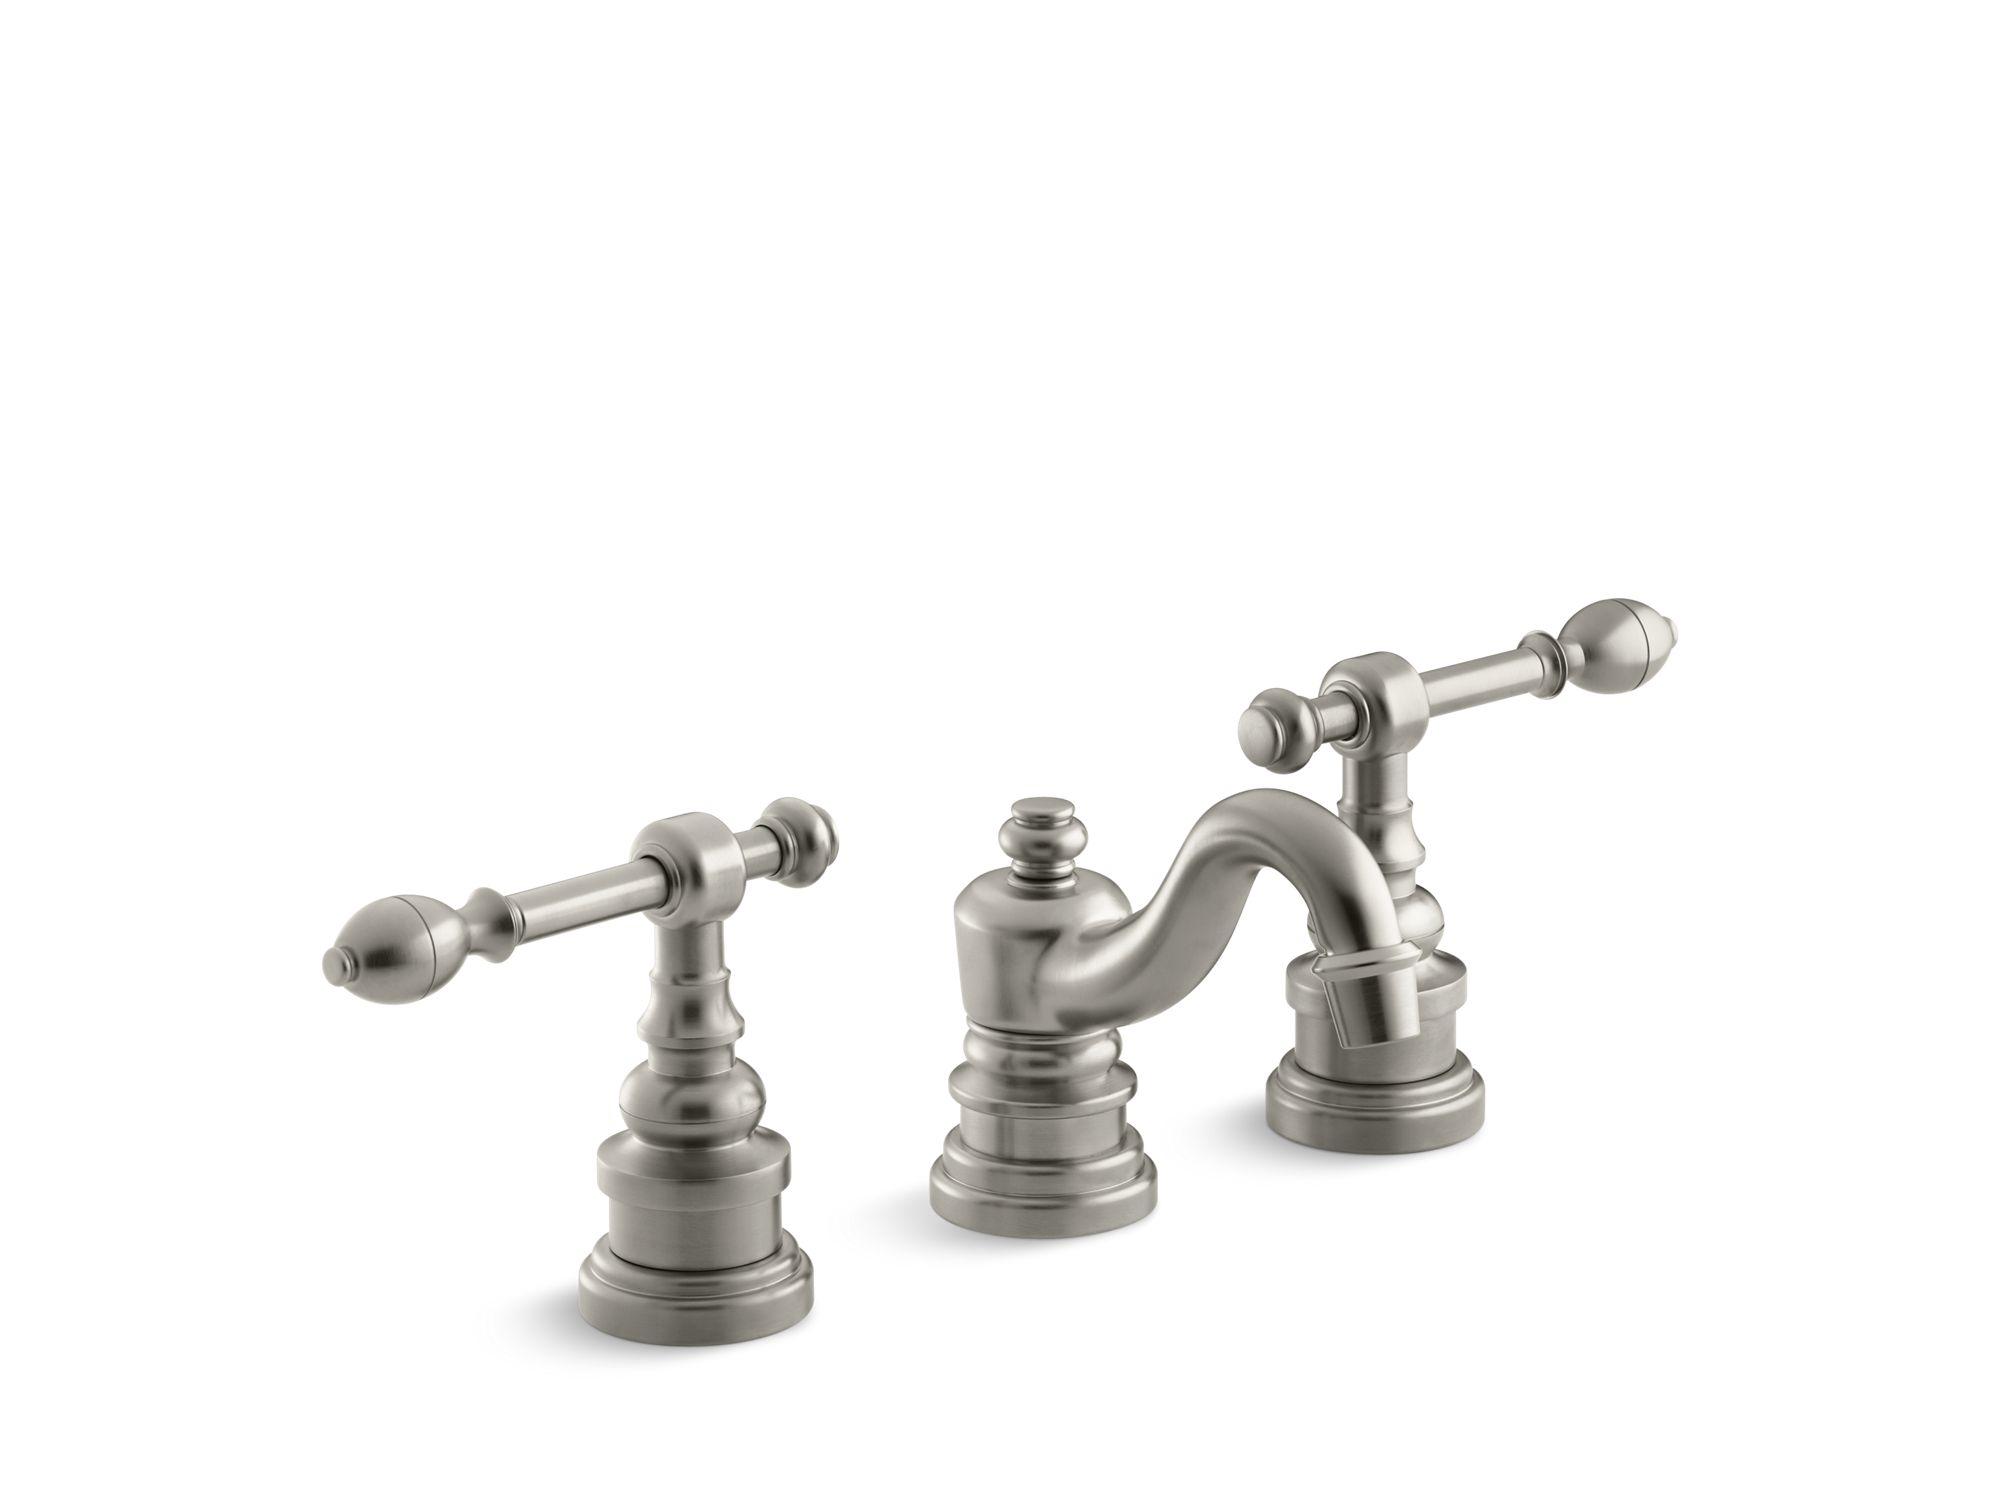 Kohler K-6811-4-BN IV Georges Brass Widespread Bathroom Sink Faucet with Lever Handles Vibrant Brushed Nickel